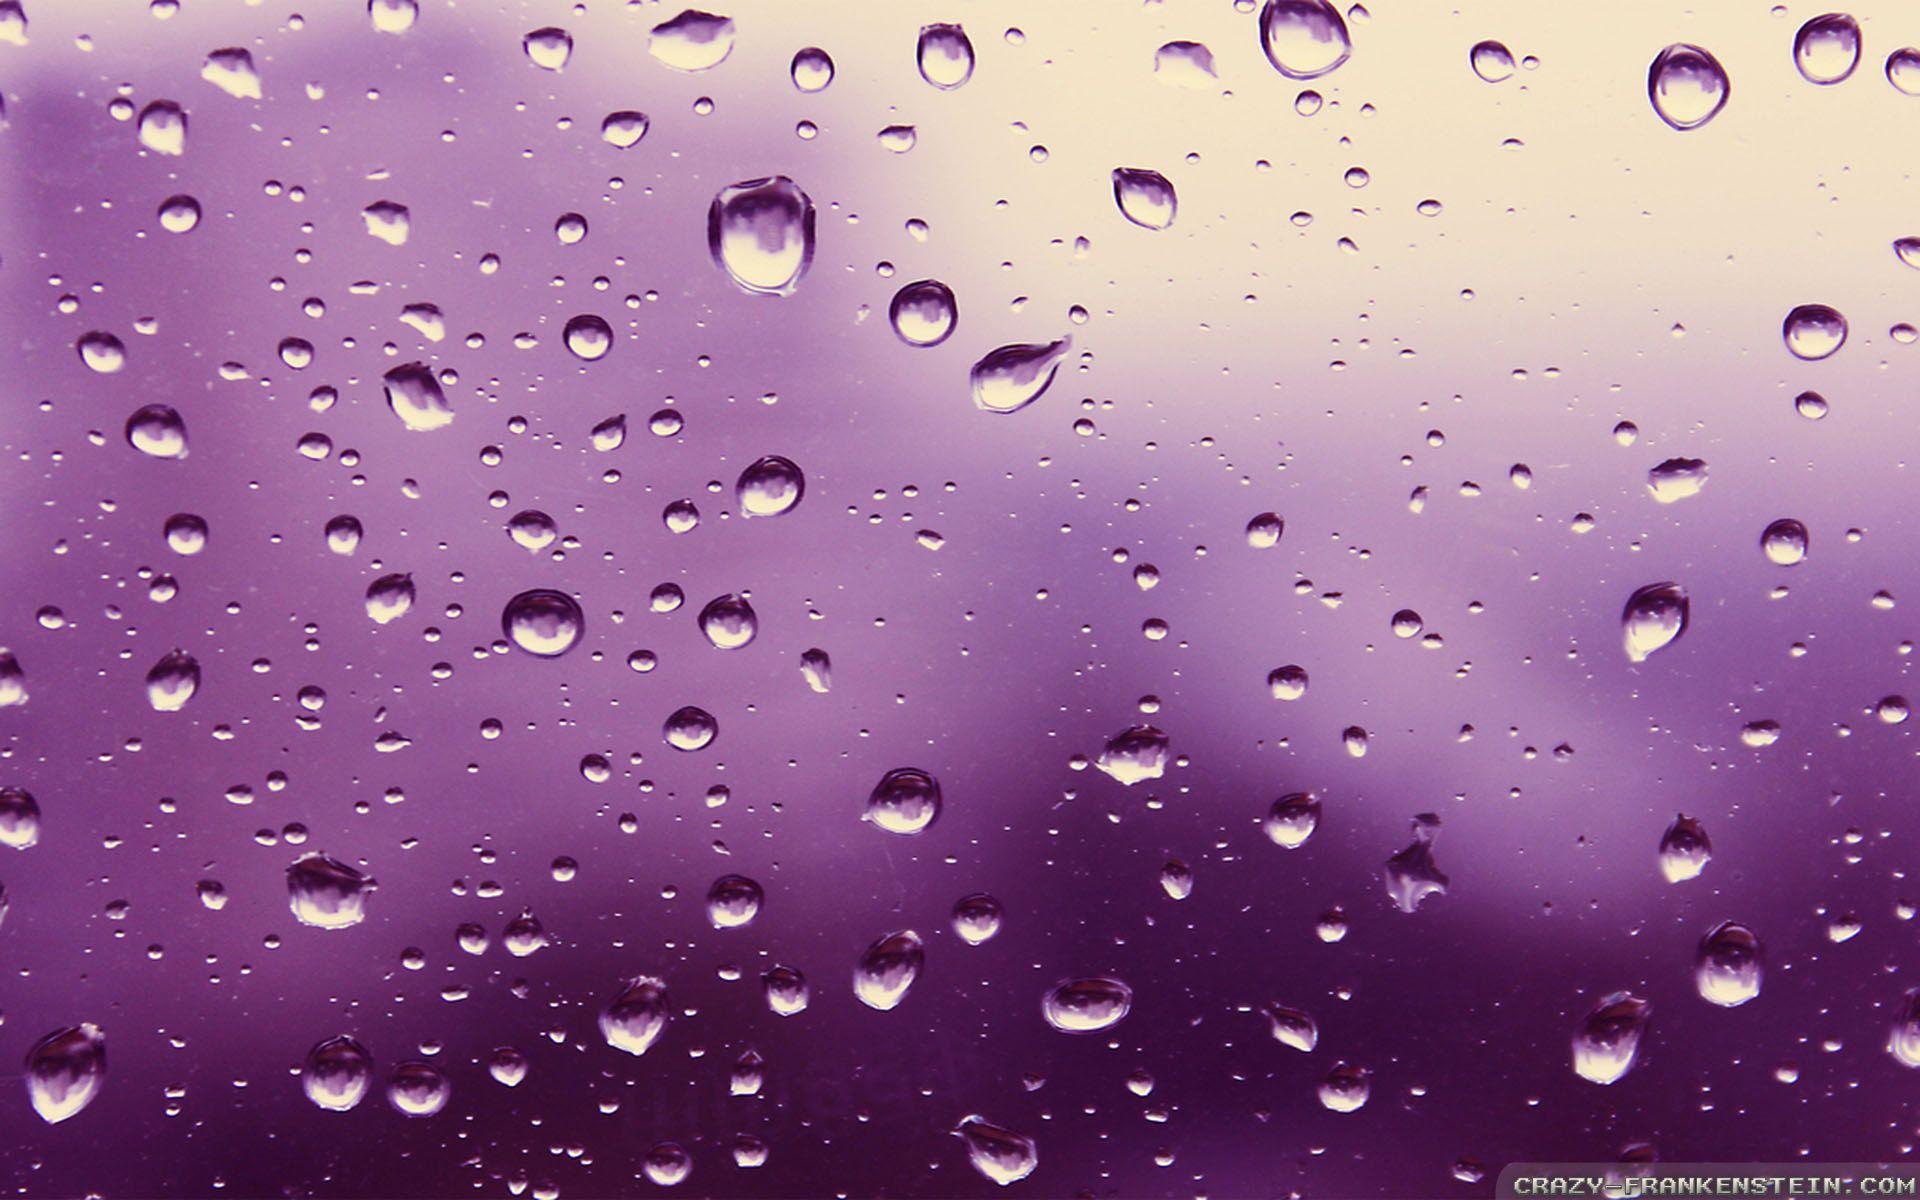 purple rain download prince